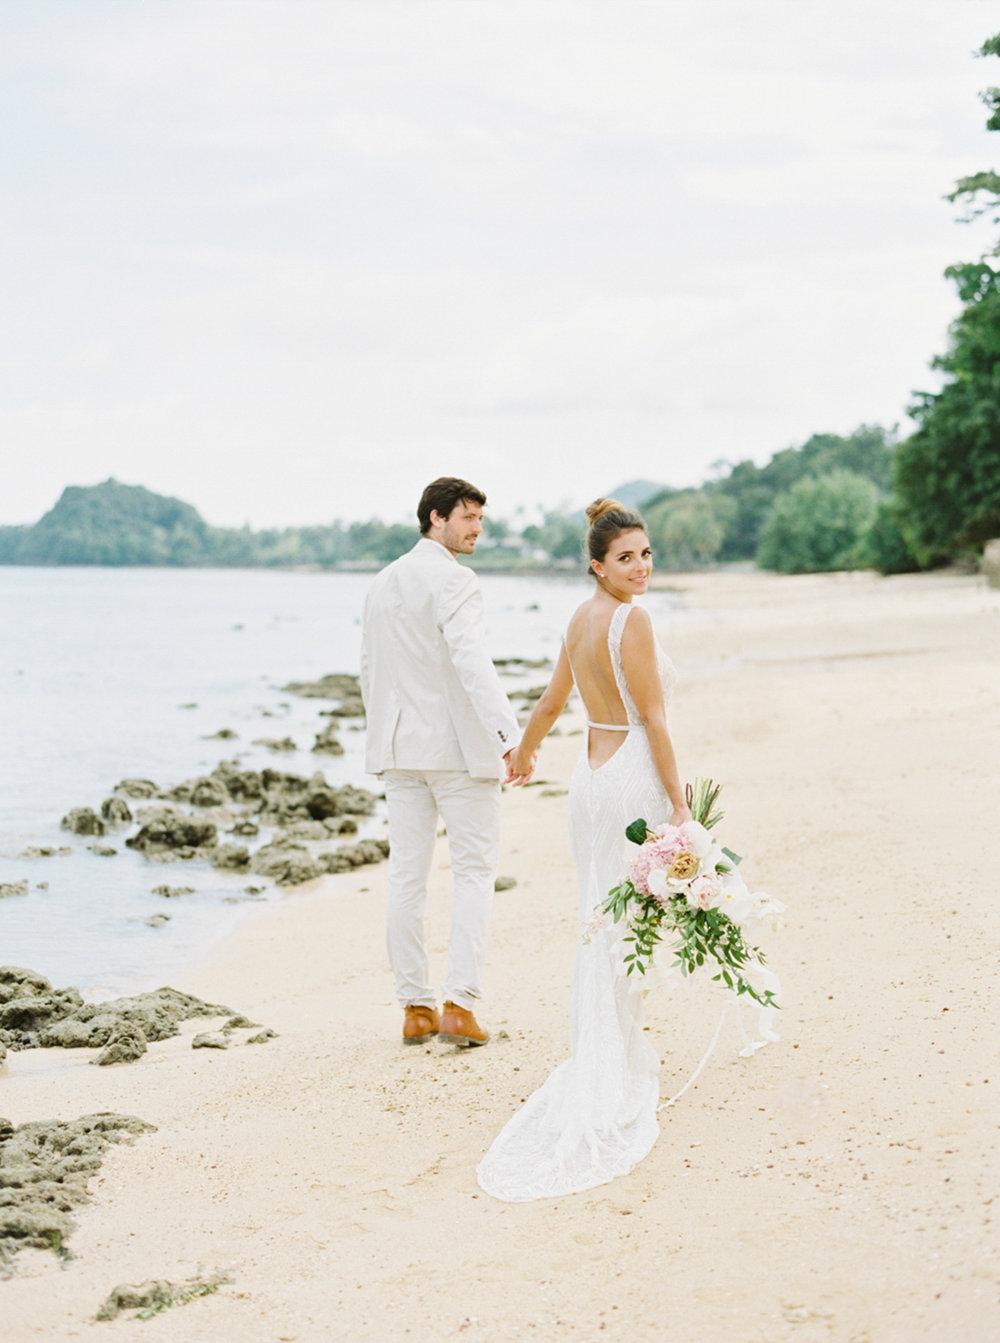 HERO IMAGE- Koh Yao Noi Thailand Elopement Destination Wedding  Photographer Sheri McMahon-2.jpg